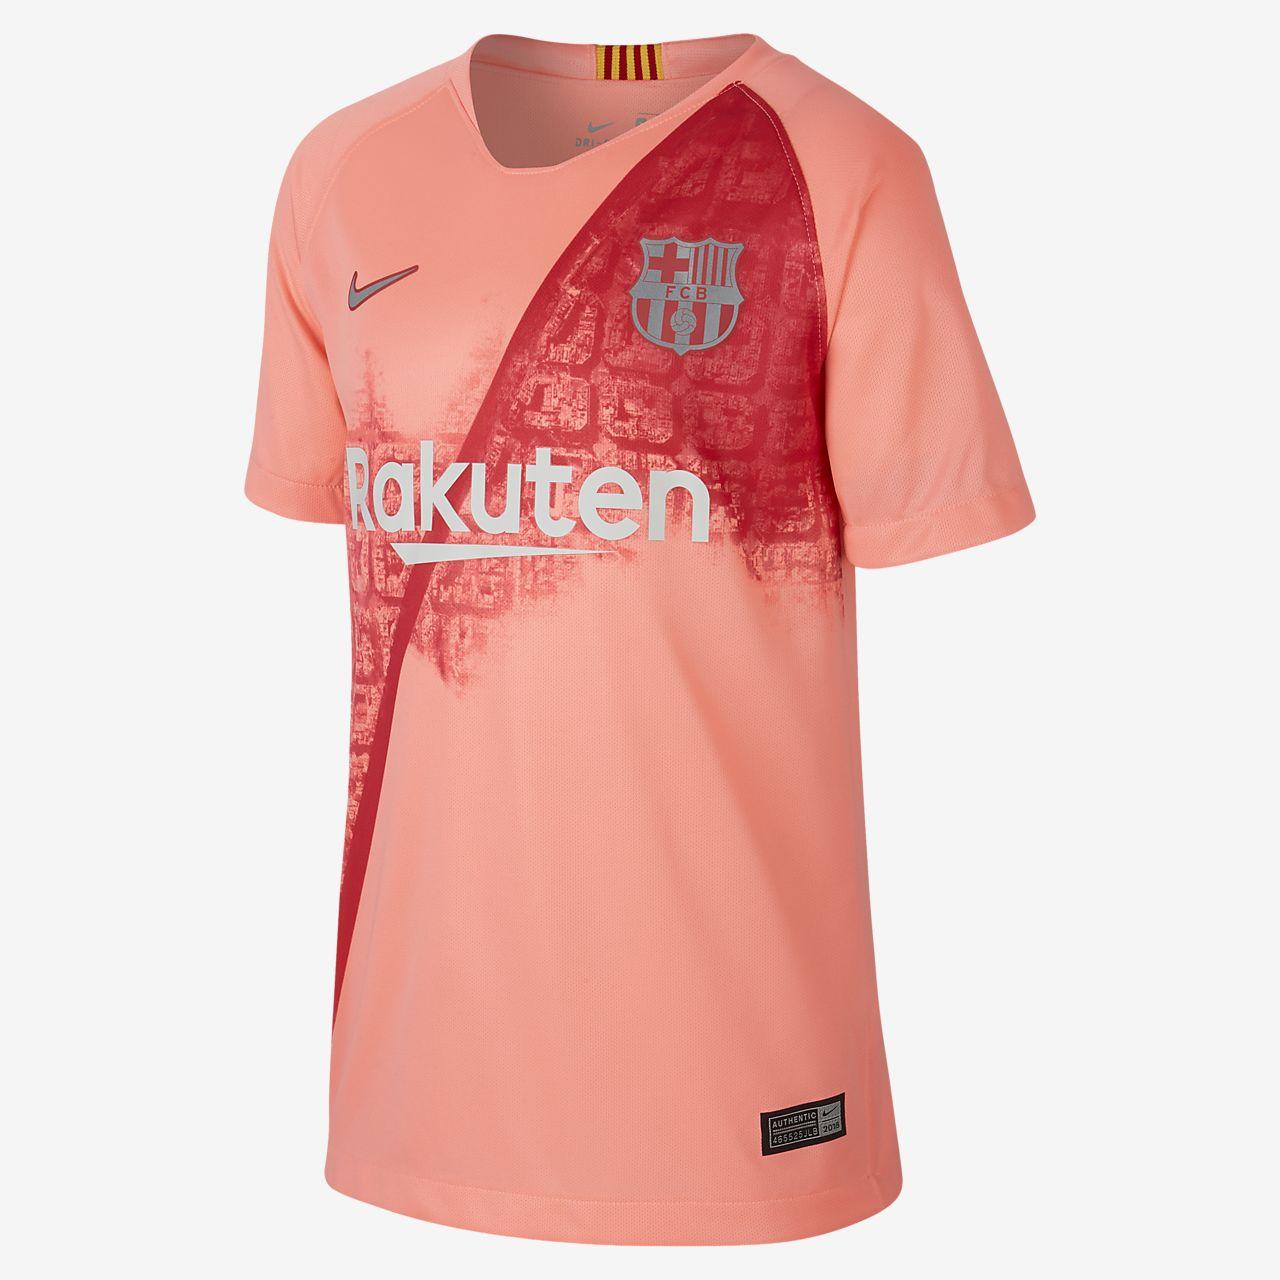 Camiseta de fútbol para niños talla grande alternativa Stadium del FC Barcelona  2018 19 1407909ca25